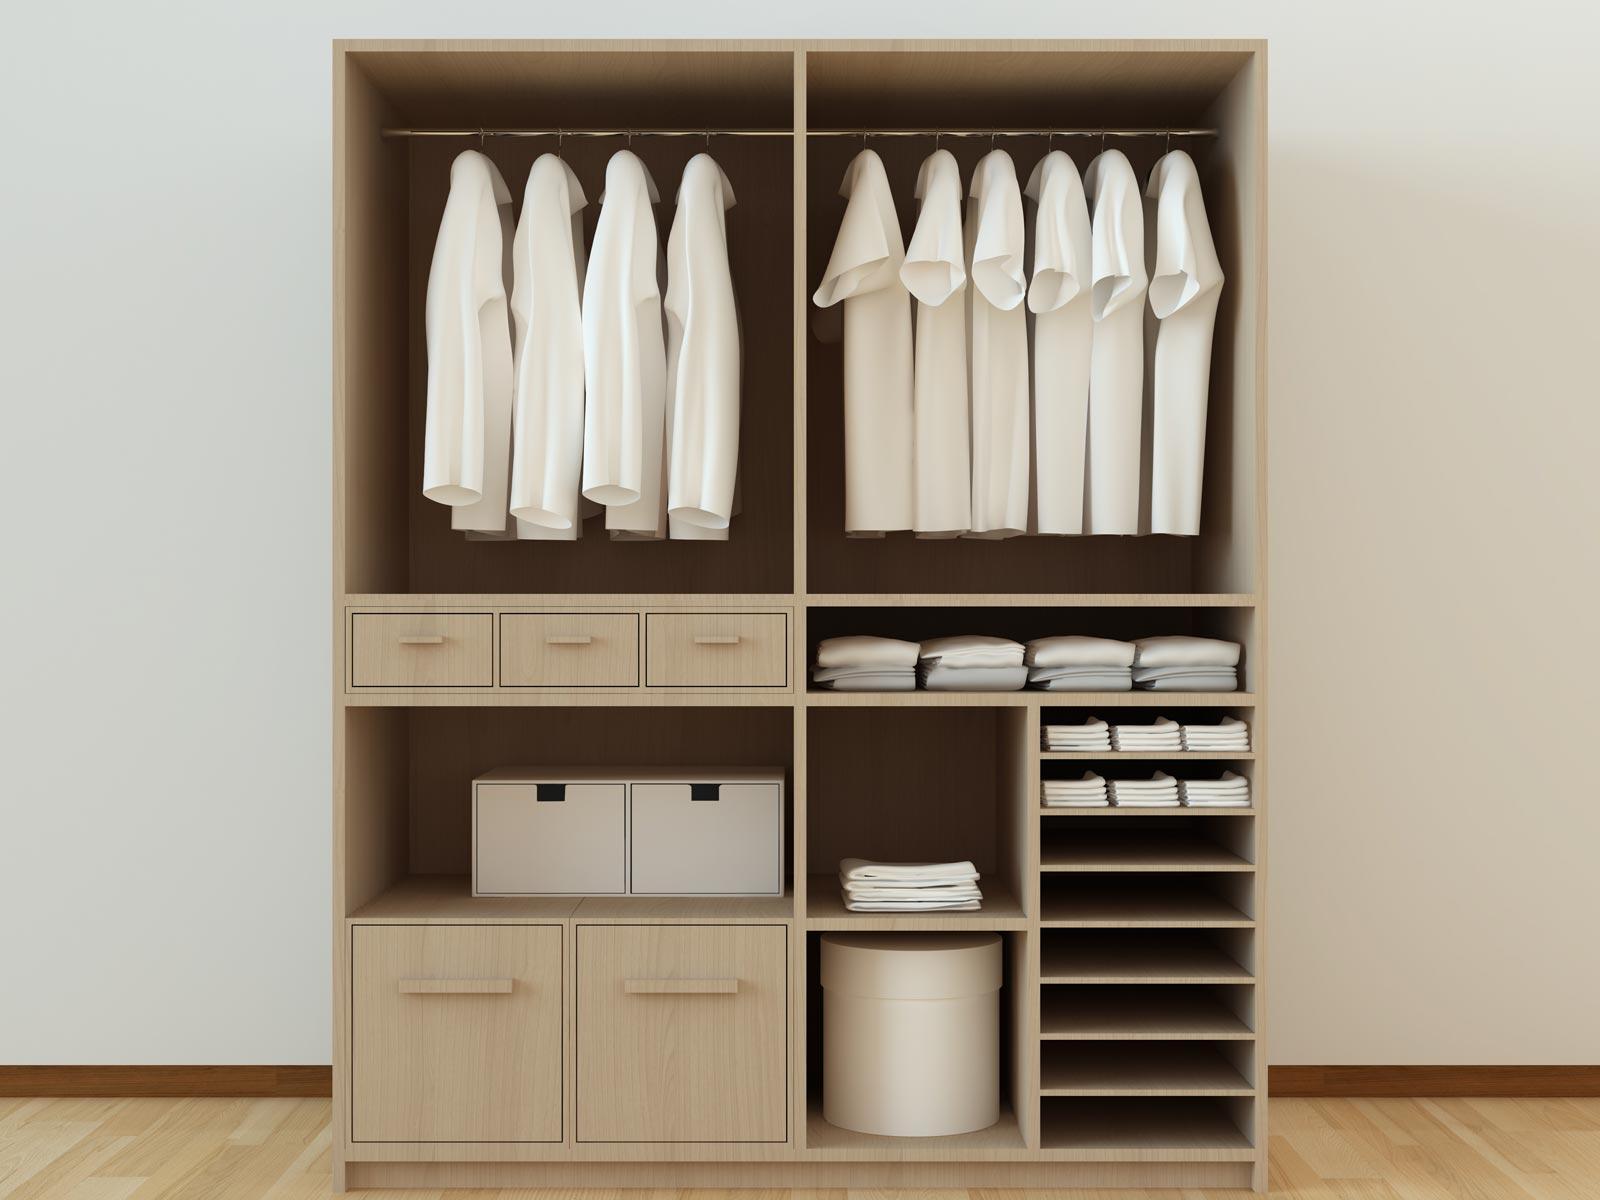 Meuble sur mesure pour la chambre dressing sur mesure for Closet en madera para habitaciones